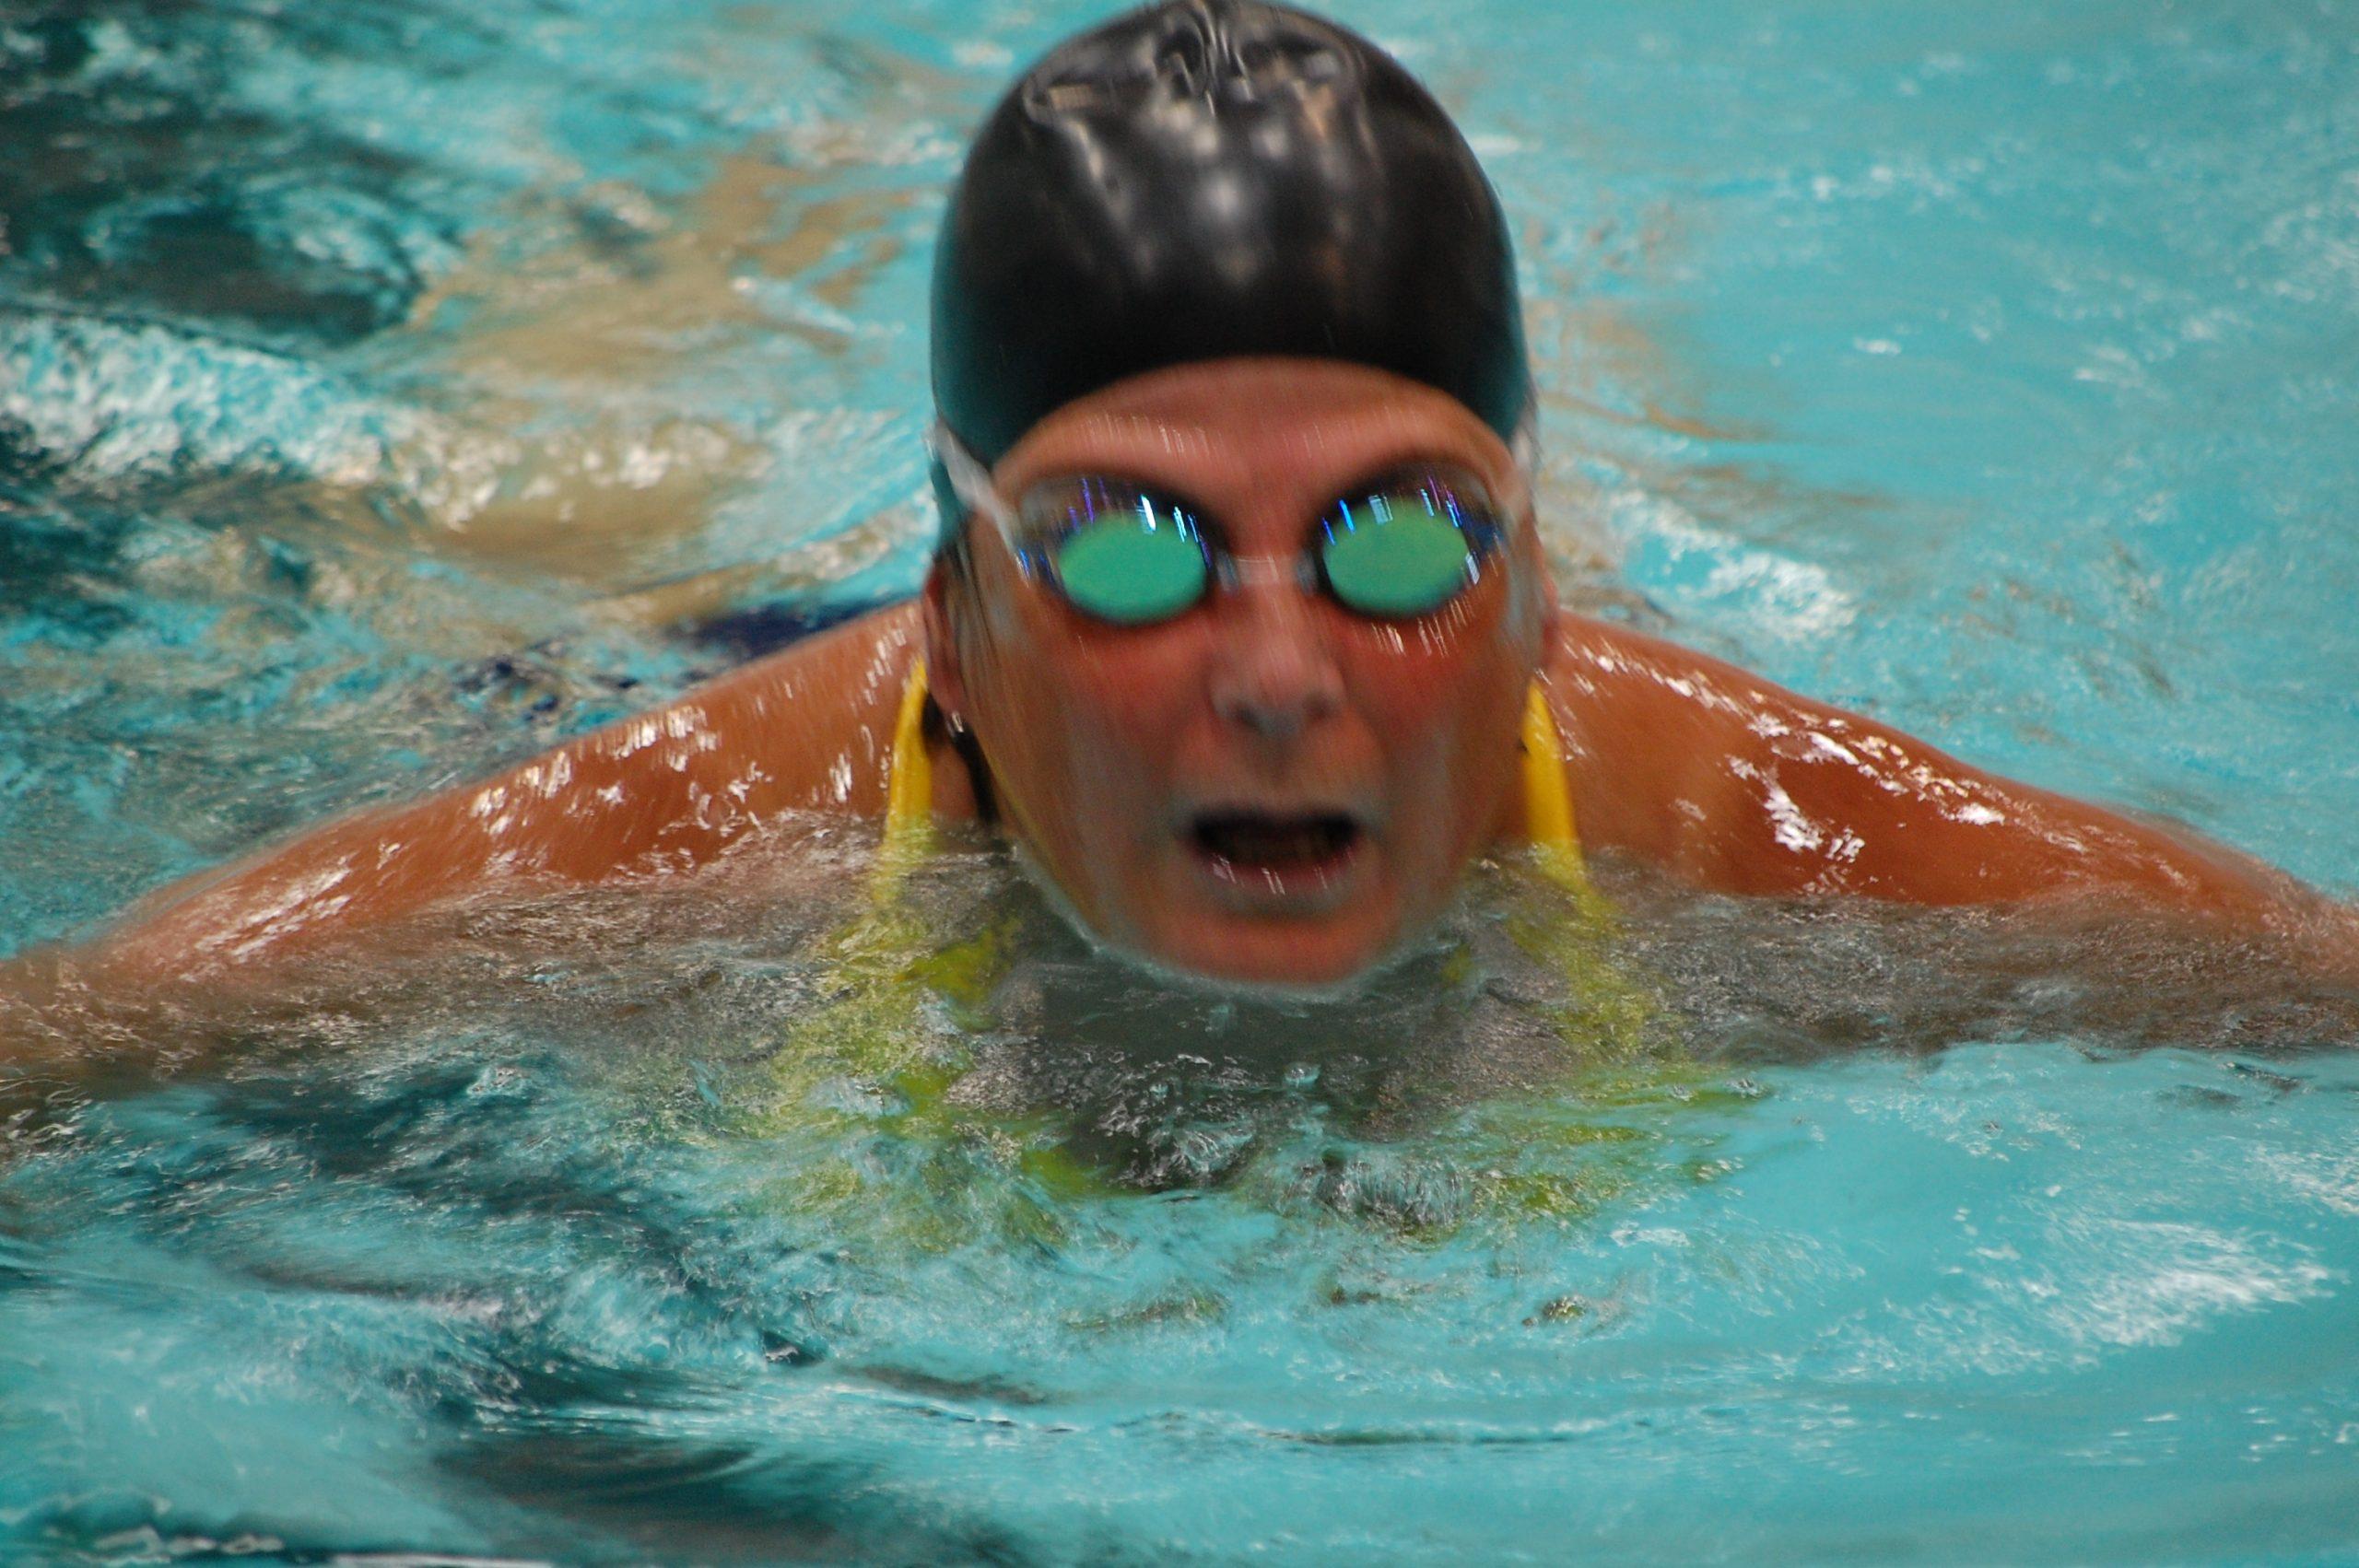 Patricia j scot is swimming